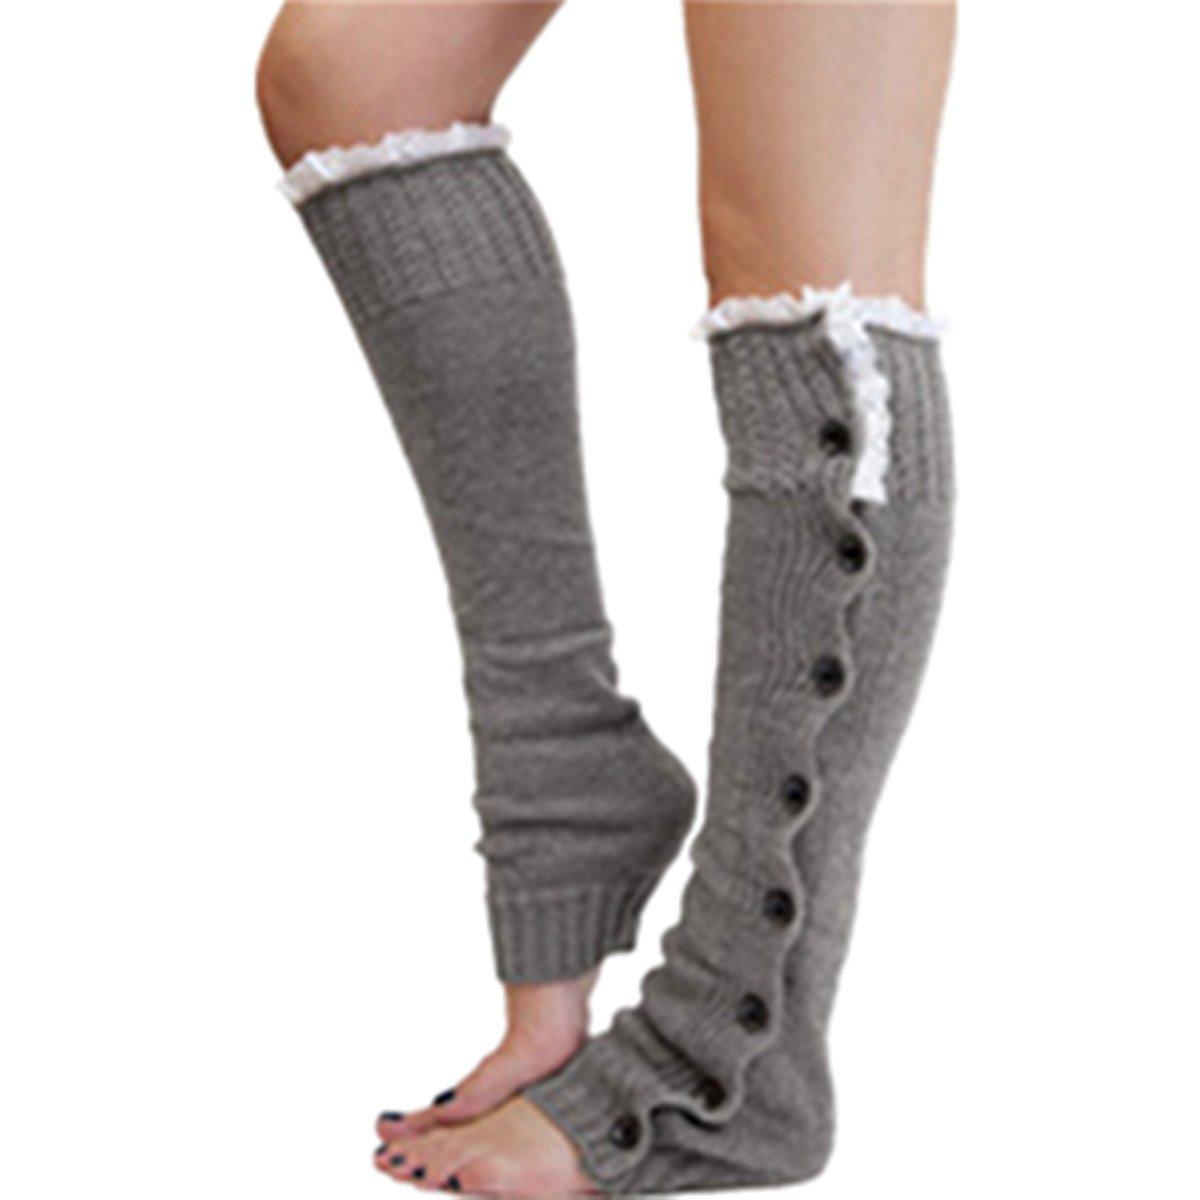 Clearance! E-Papaya 2016 Women's Buttons Leg Warmer Knit Boot Socks Topper Cuff (Y-Light Grey)